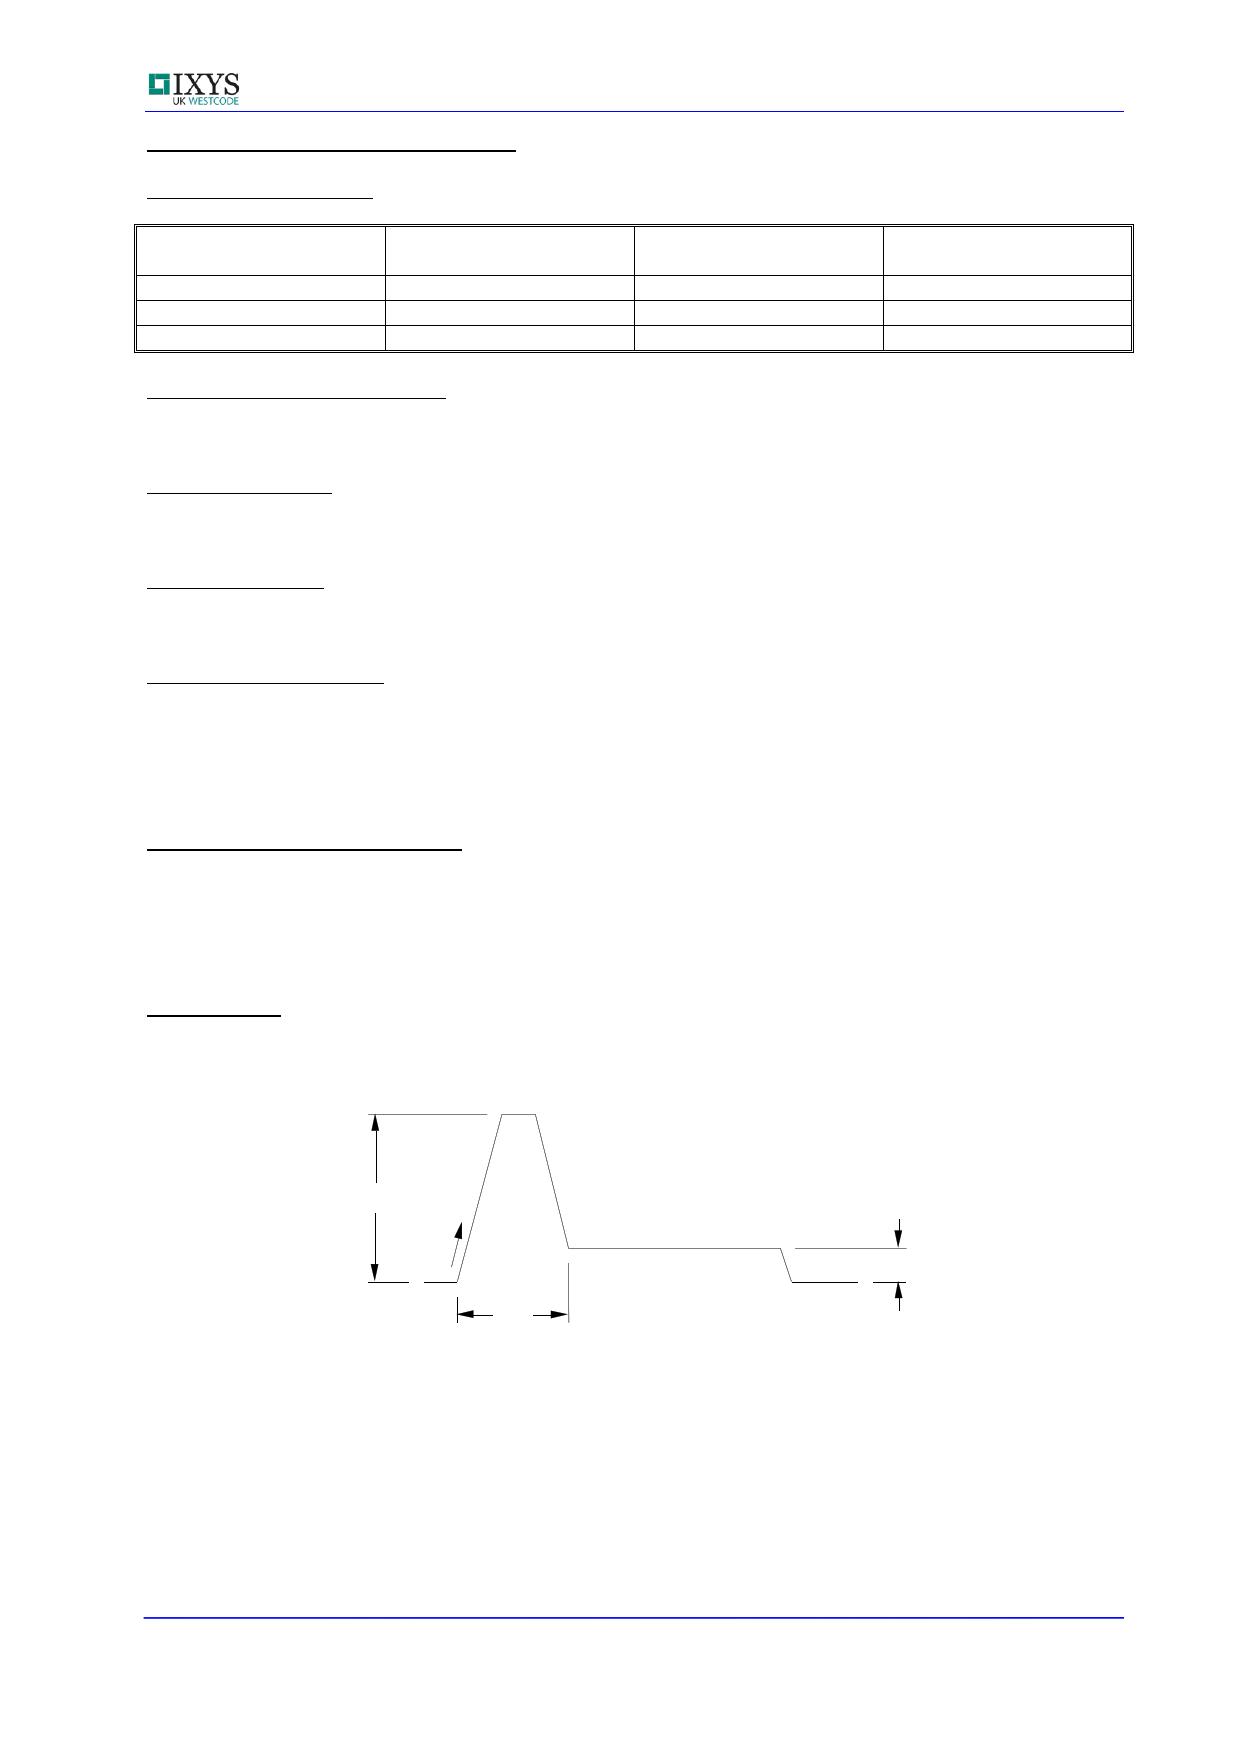 N0180SH160 pdf, ピン配列